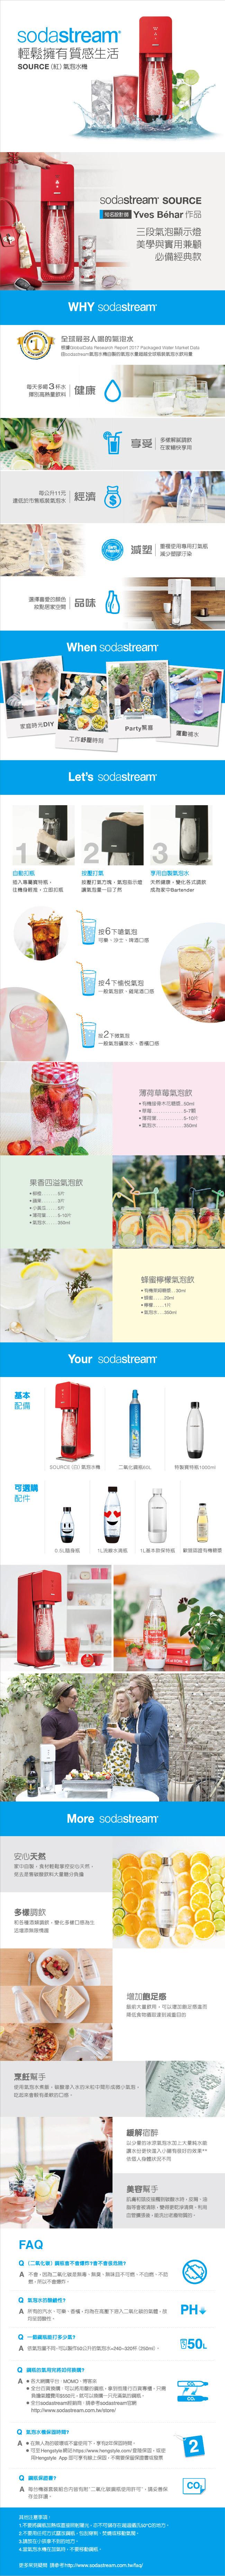 Sodastream Source plastic 氣泡水機 自動扣瓶